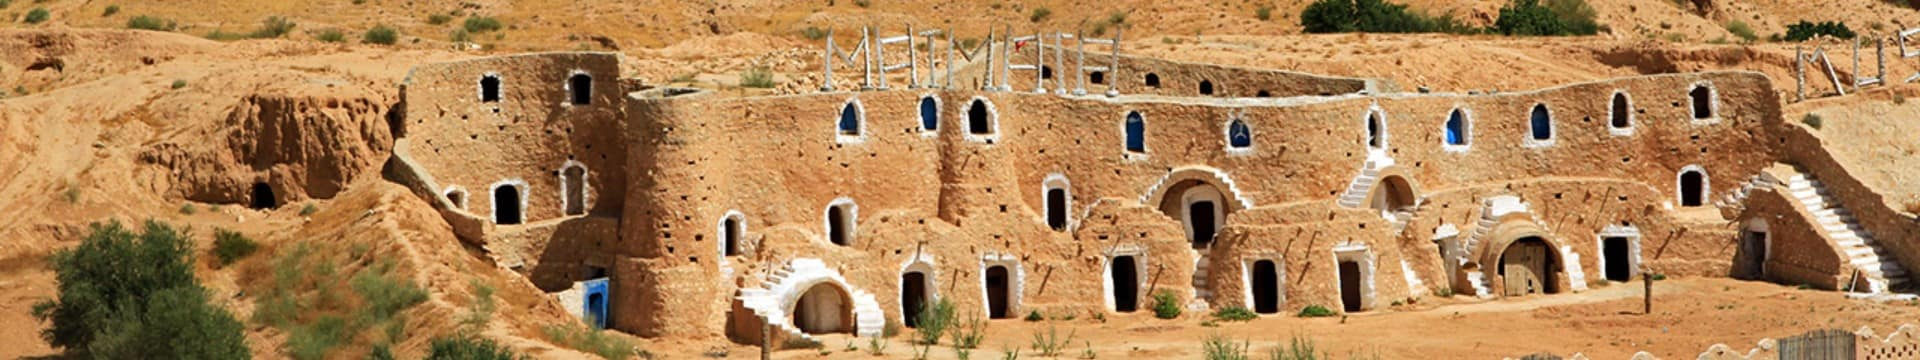 Vila Triglodyte - Matmata, Tunísia.